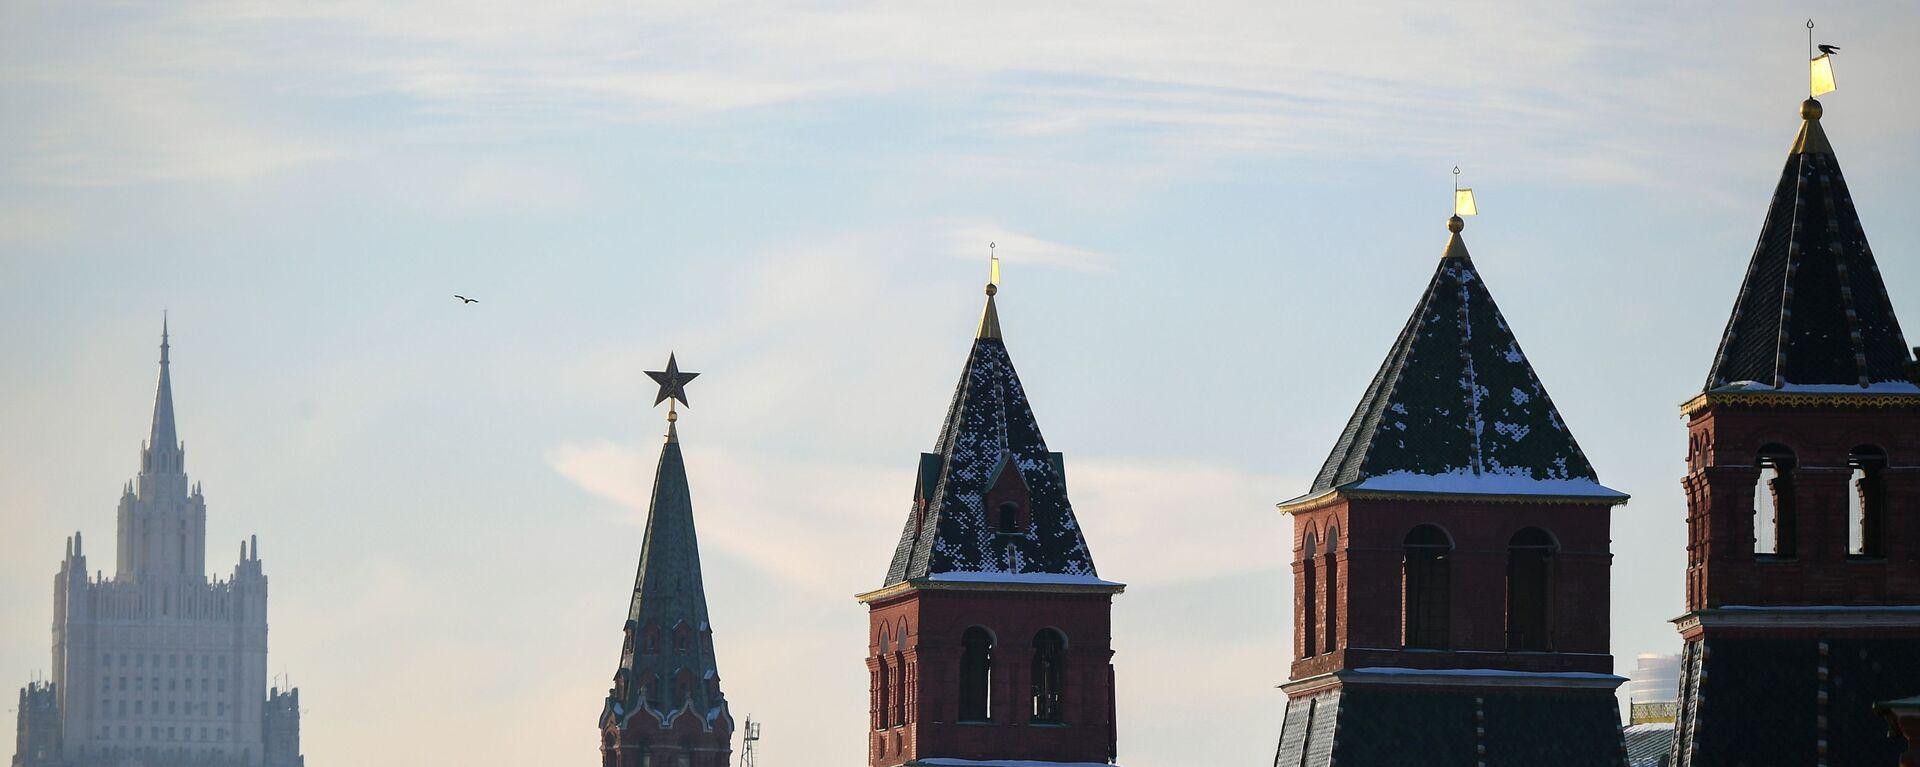 El Kremlin de Moscú, Rusia - Sputnik Mundo, 1920, 03.02.2021